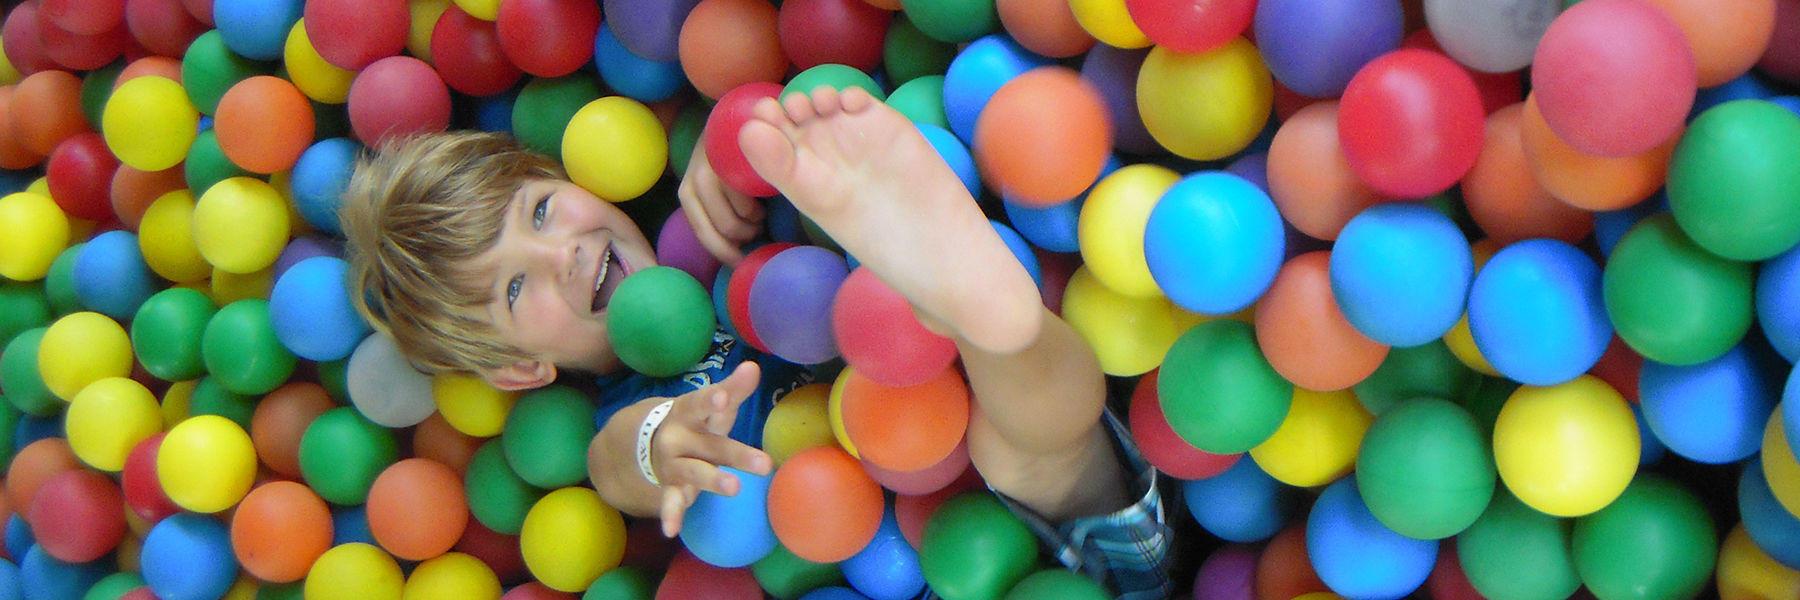 Amusement Parks & Family Fun